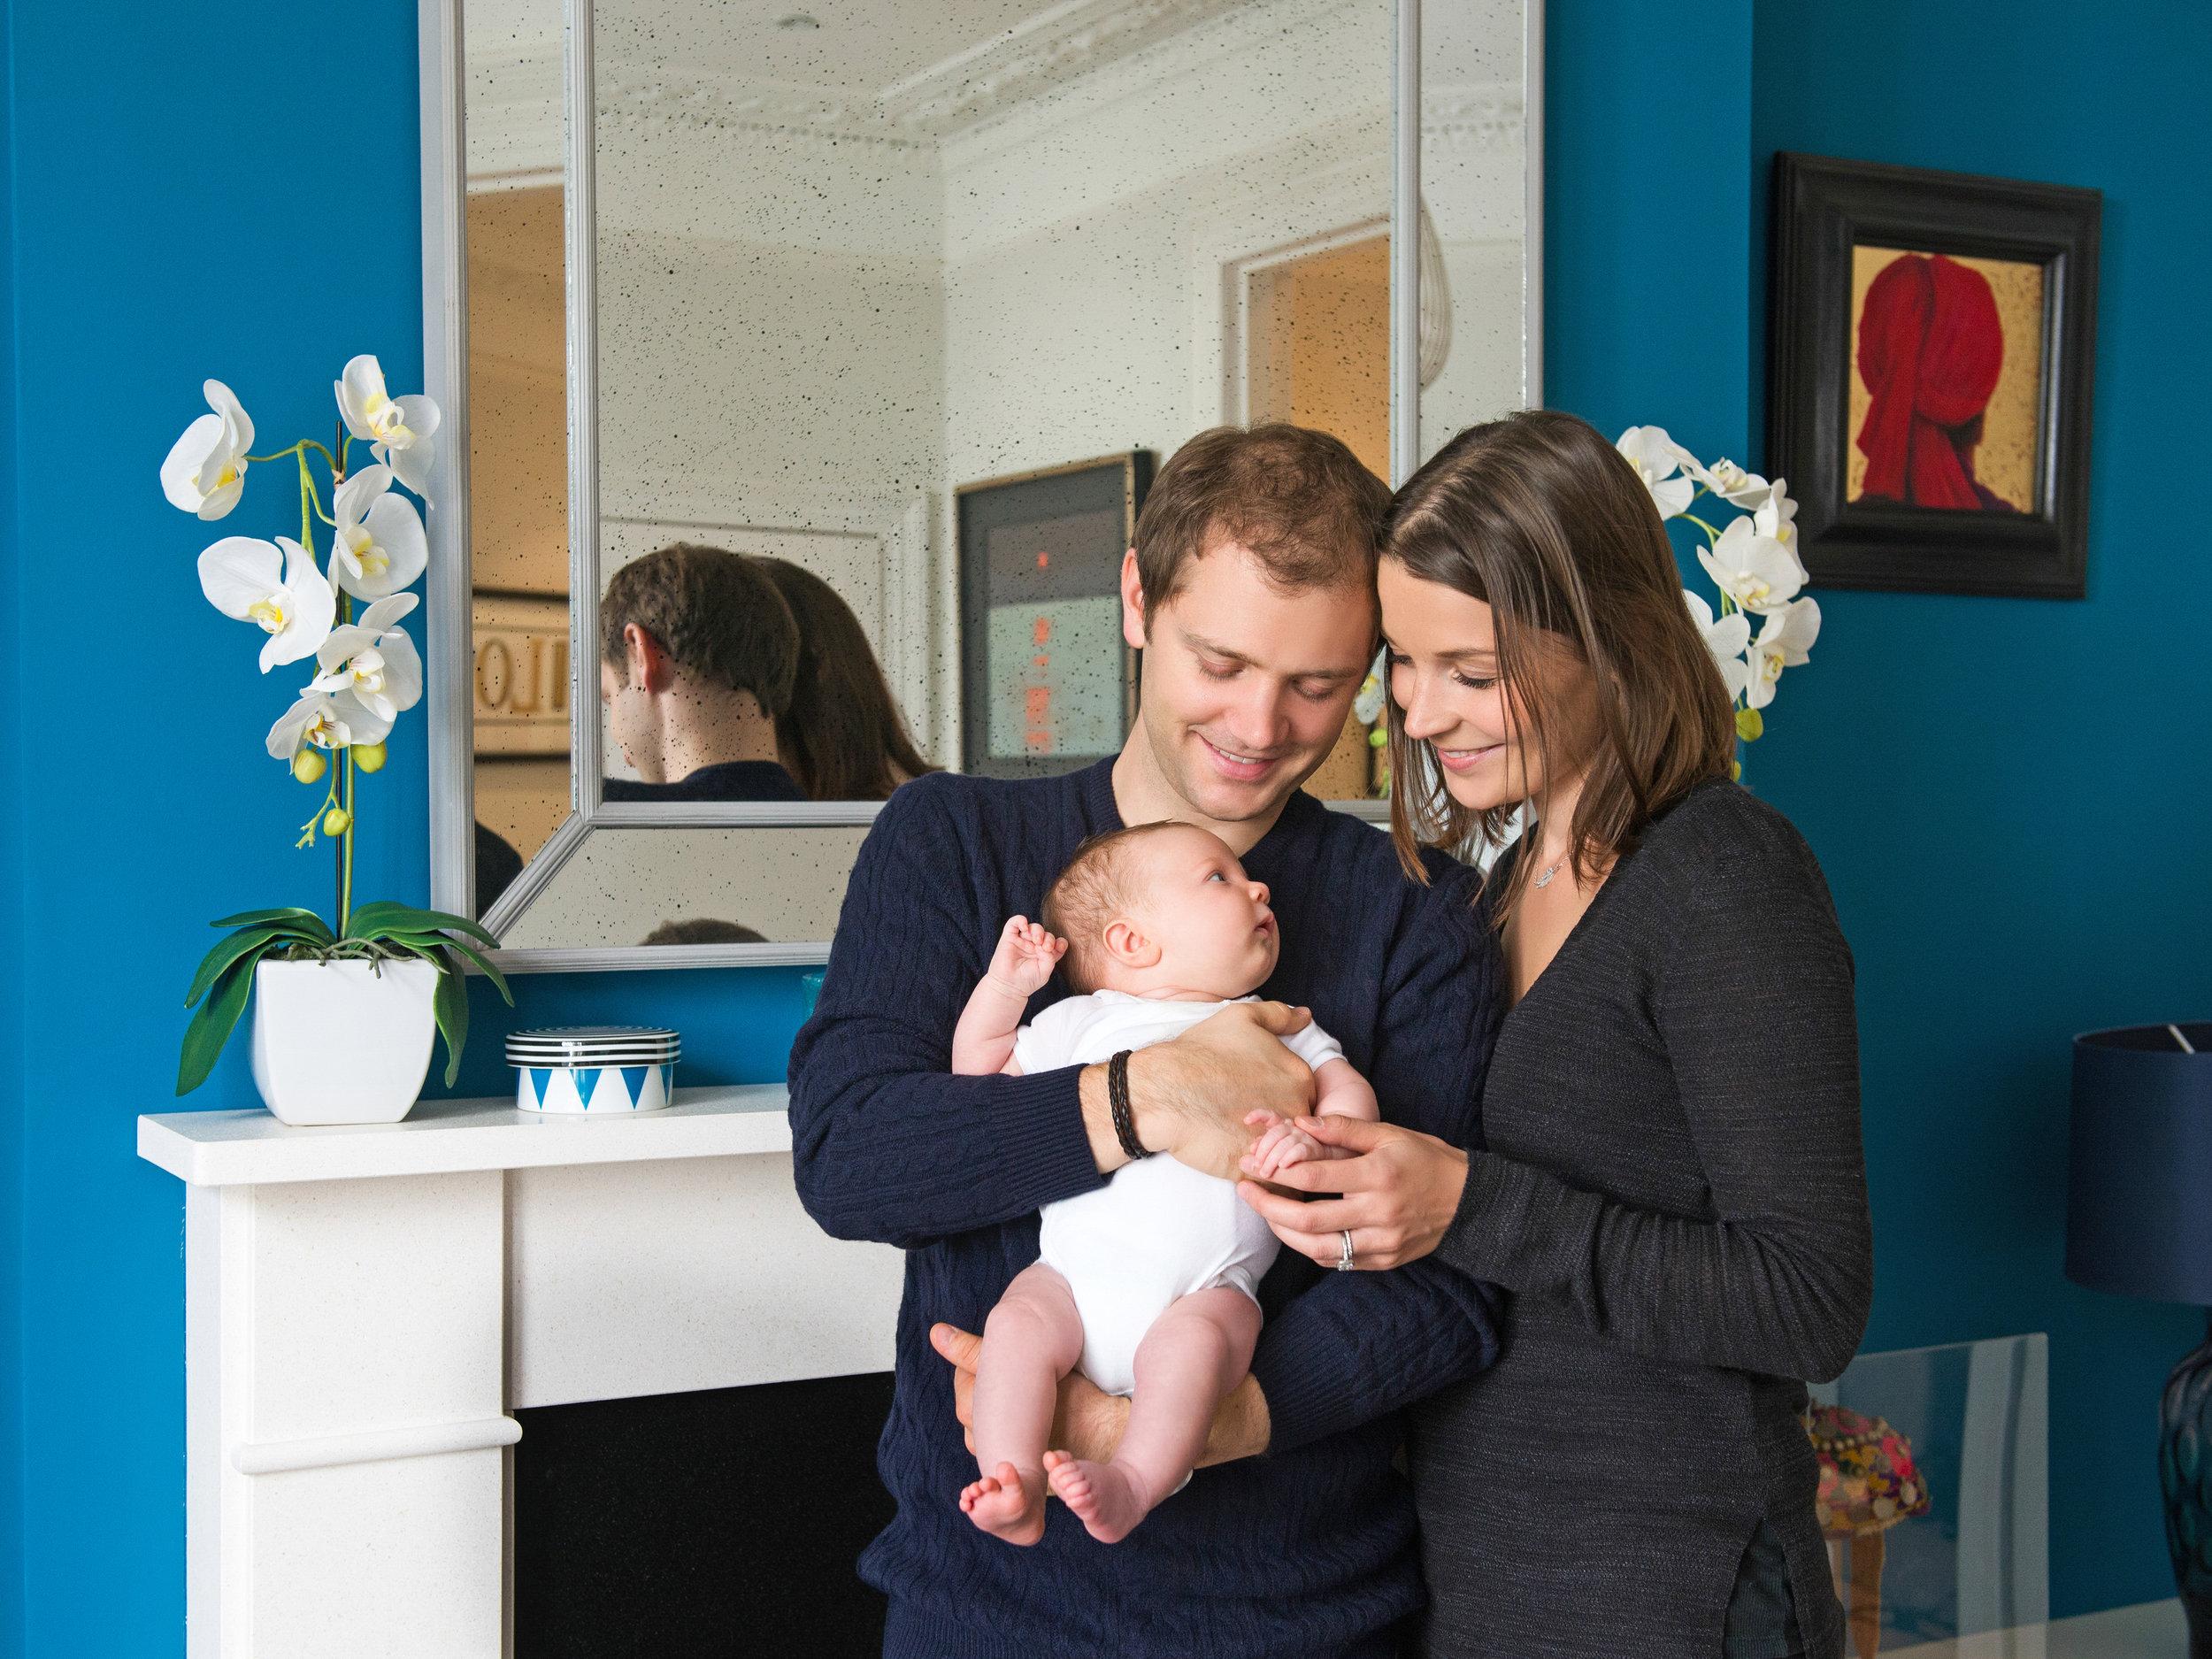 newborn-baby-photography-london.jpg